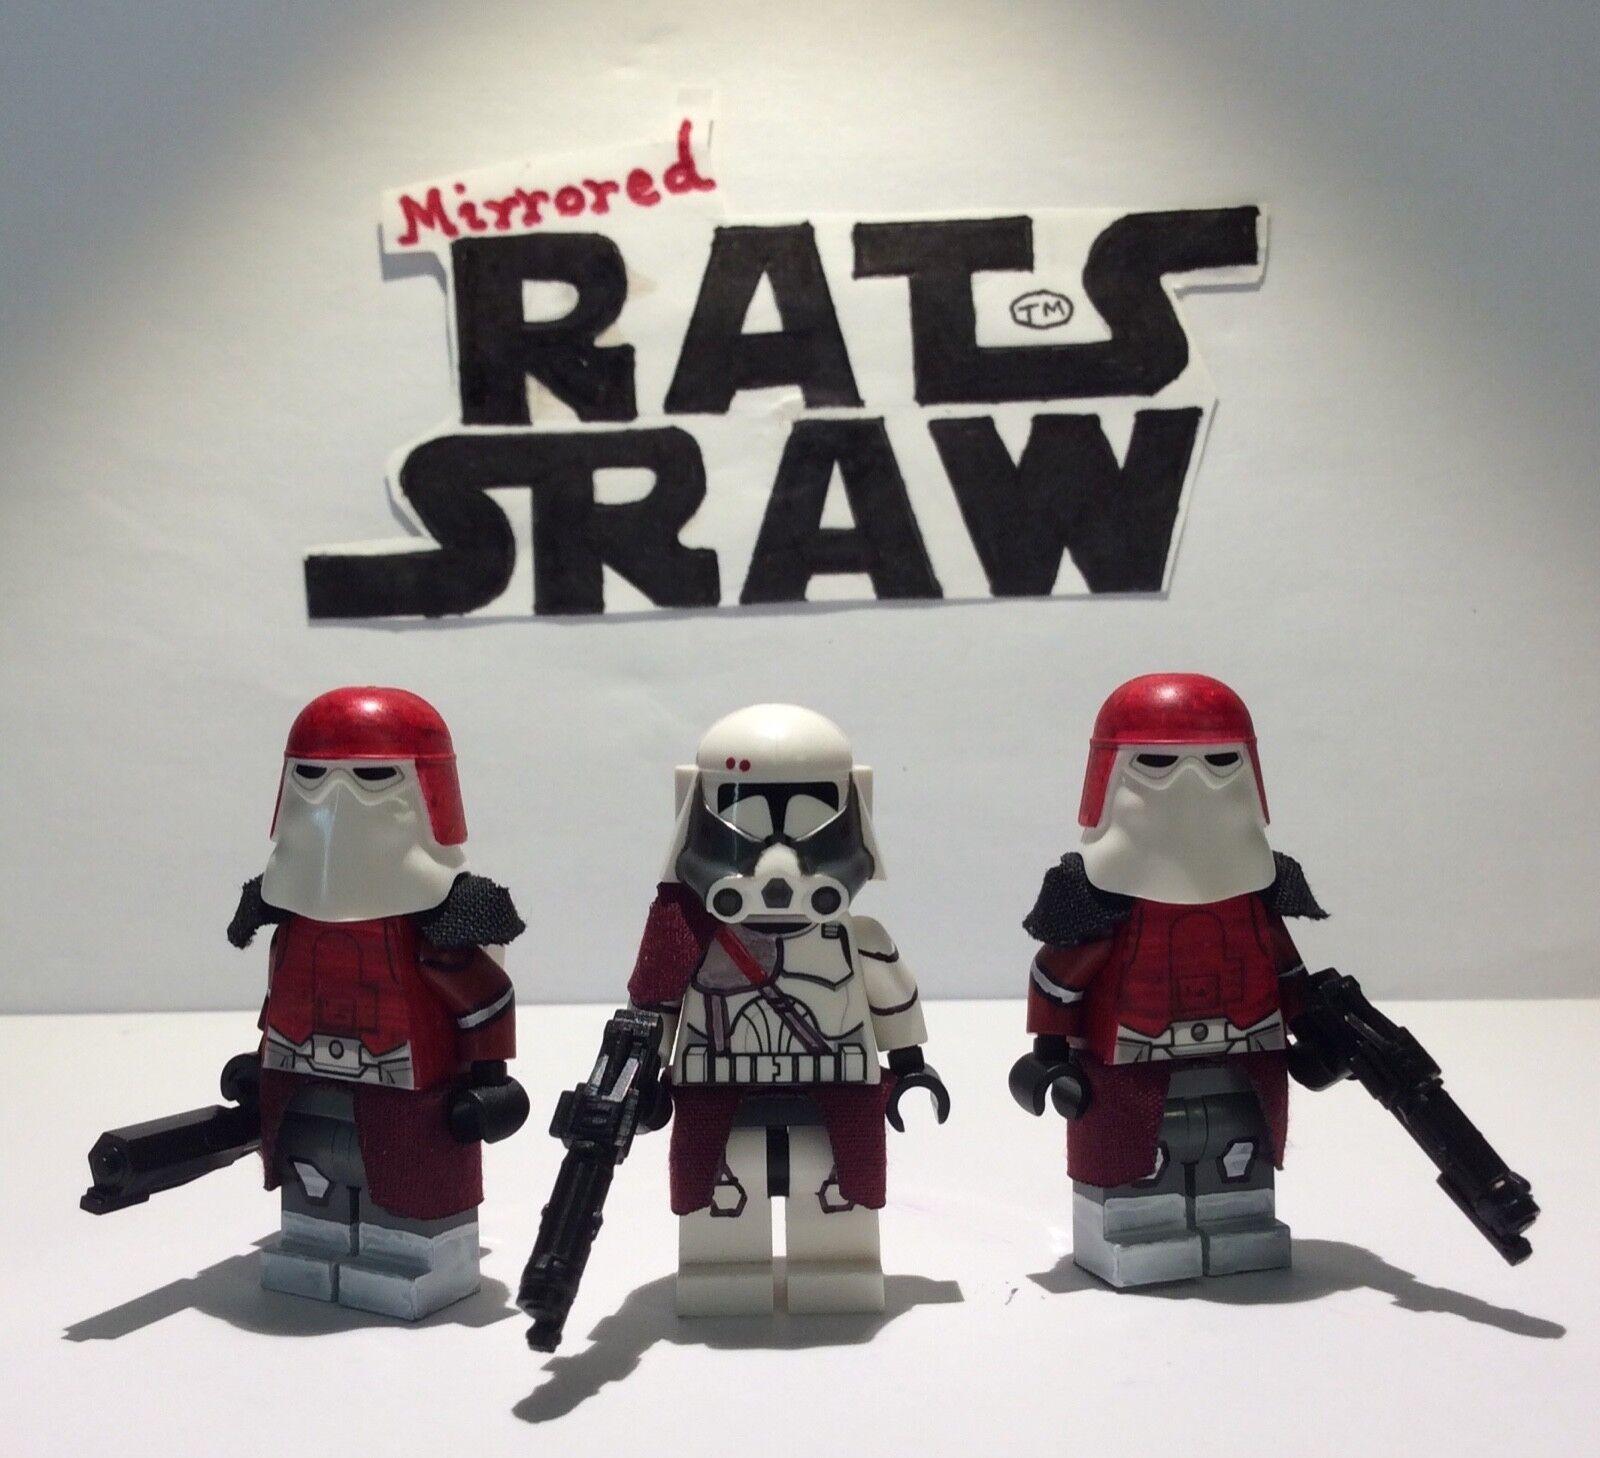 Lego Star Wars minifigures - Clone Custom - Comdr Bacara + x2 Galactic marines